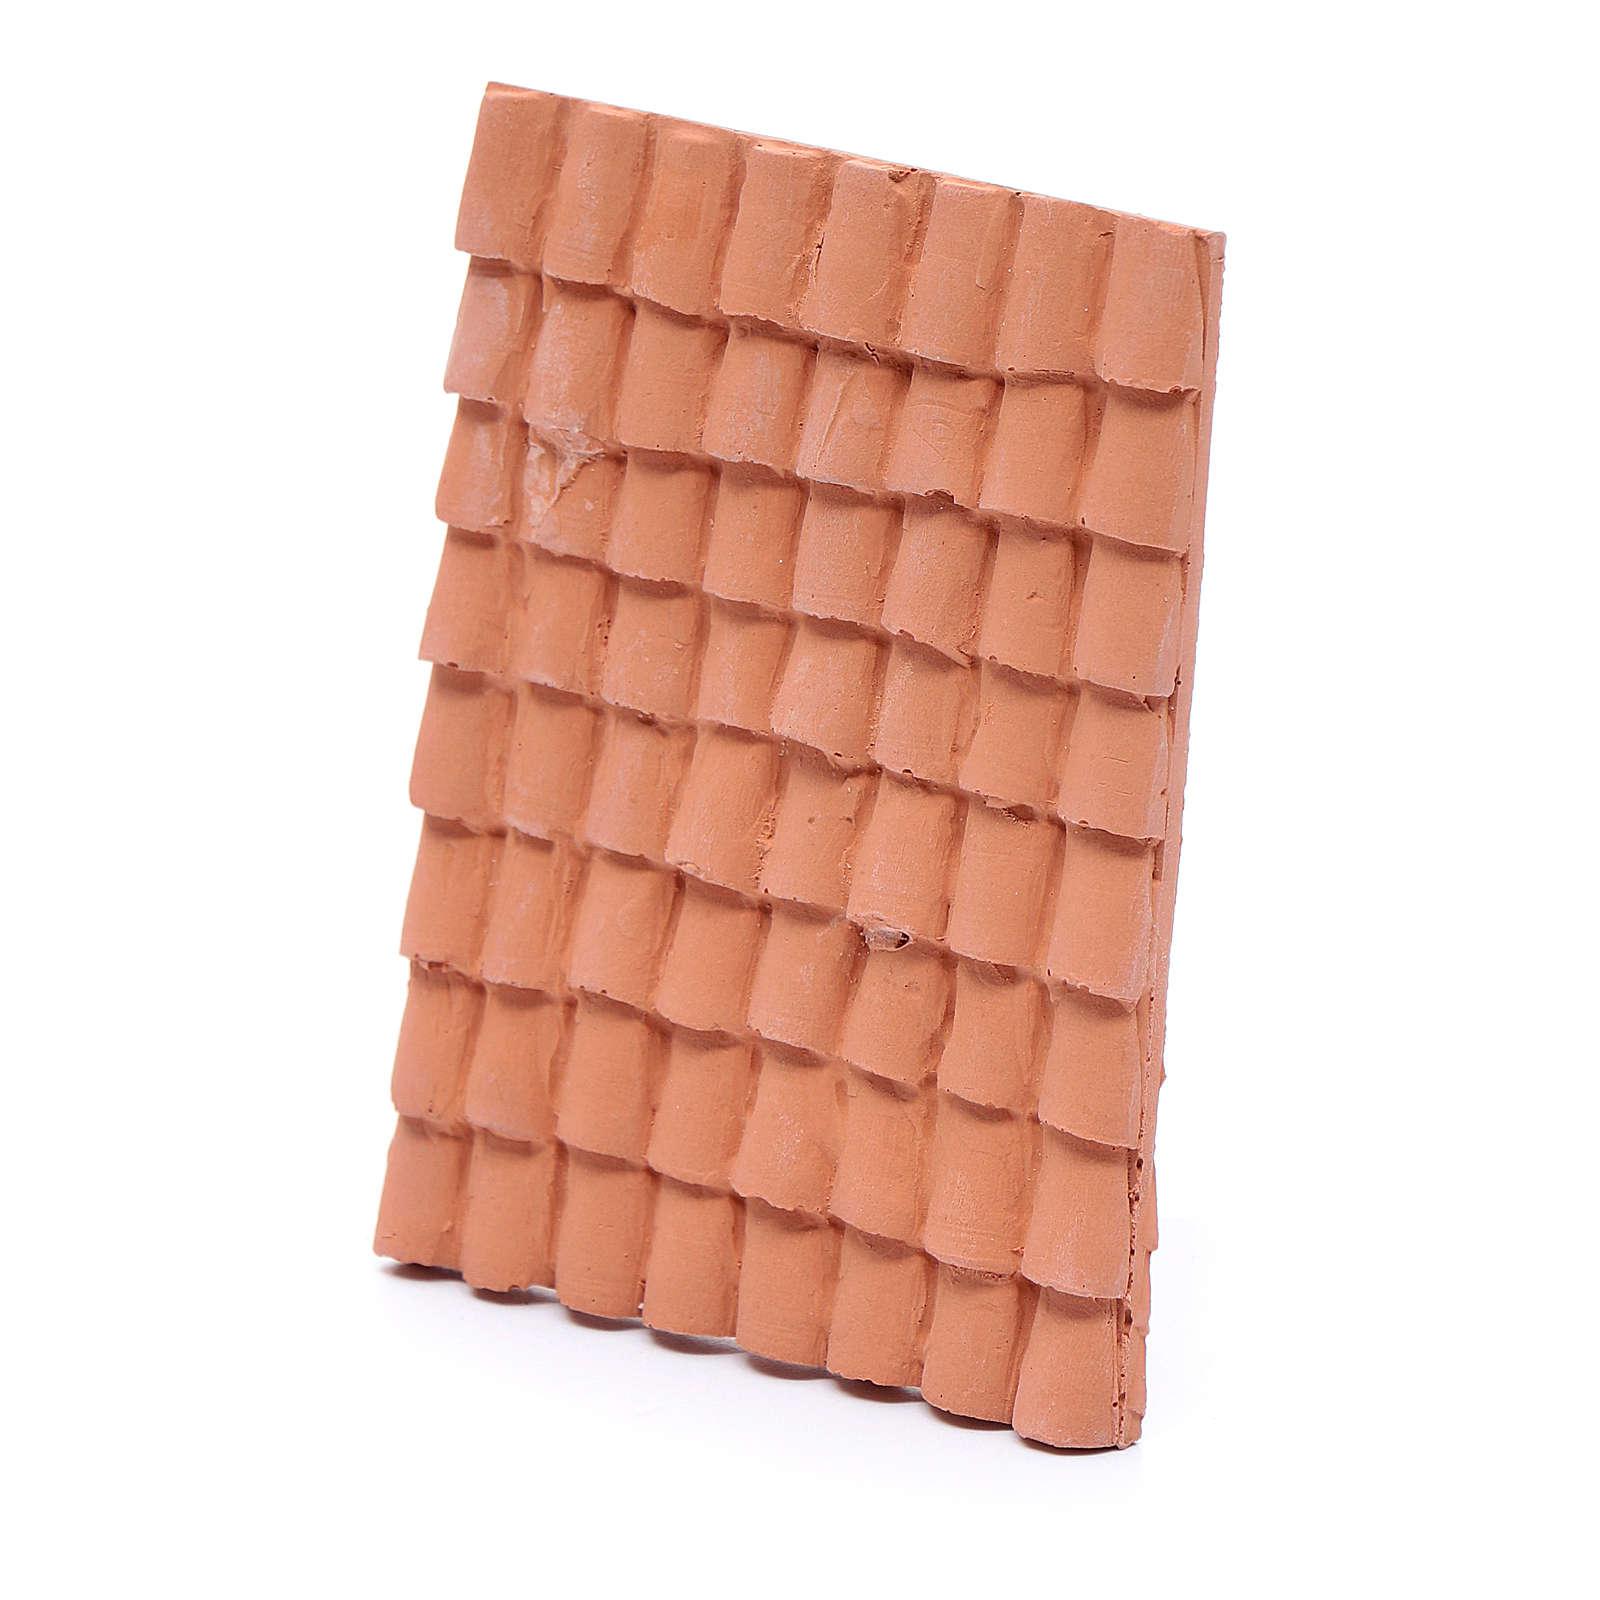 Techo con tejas 10x5 cm resina color terracota belén 4